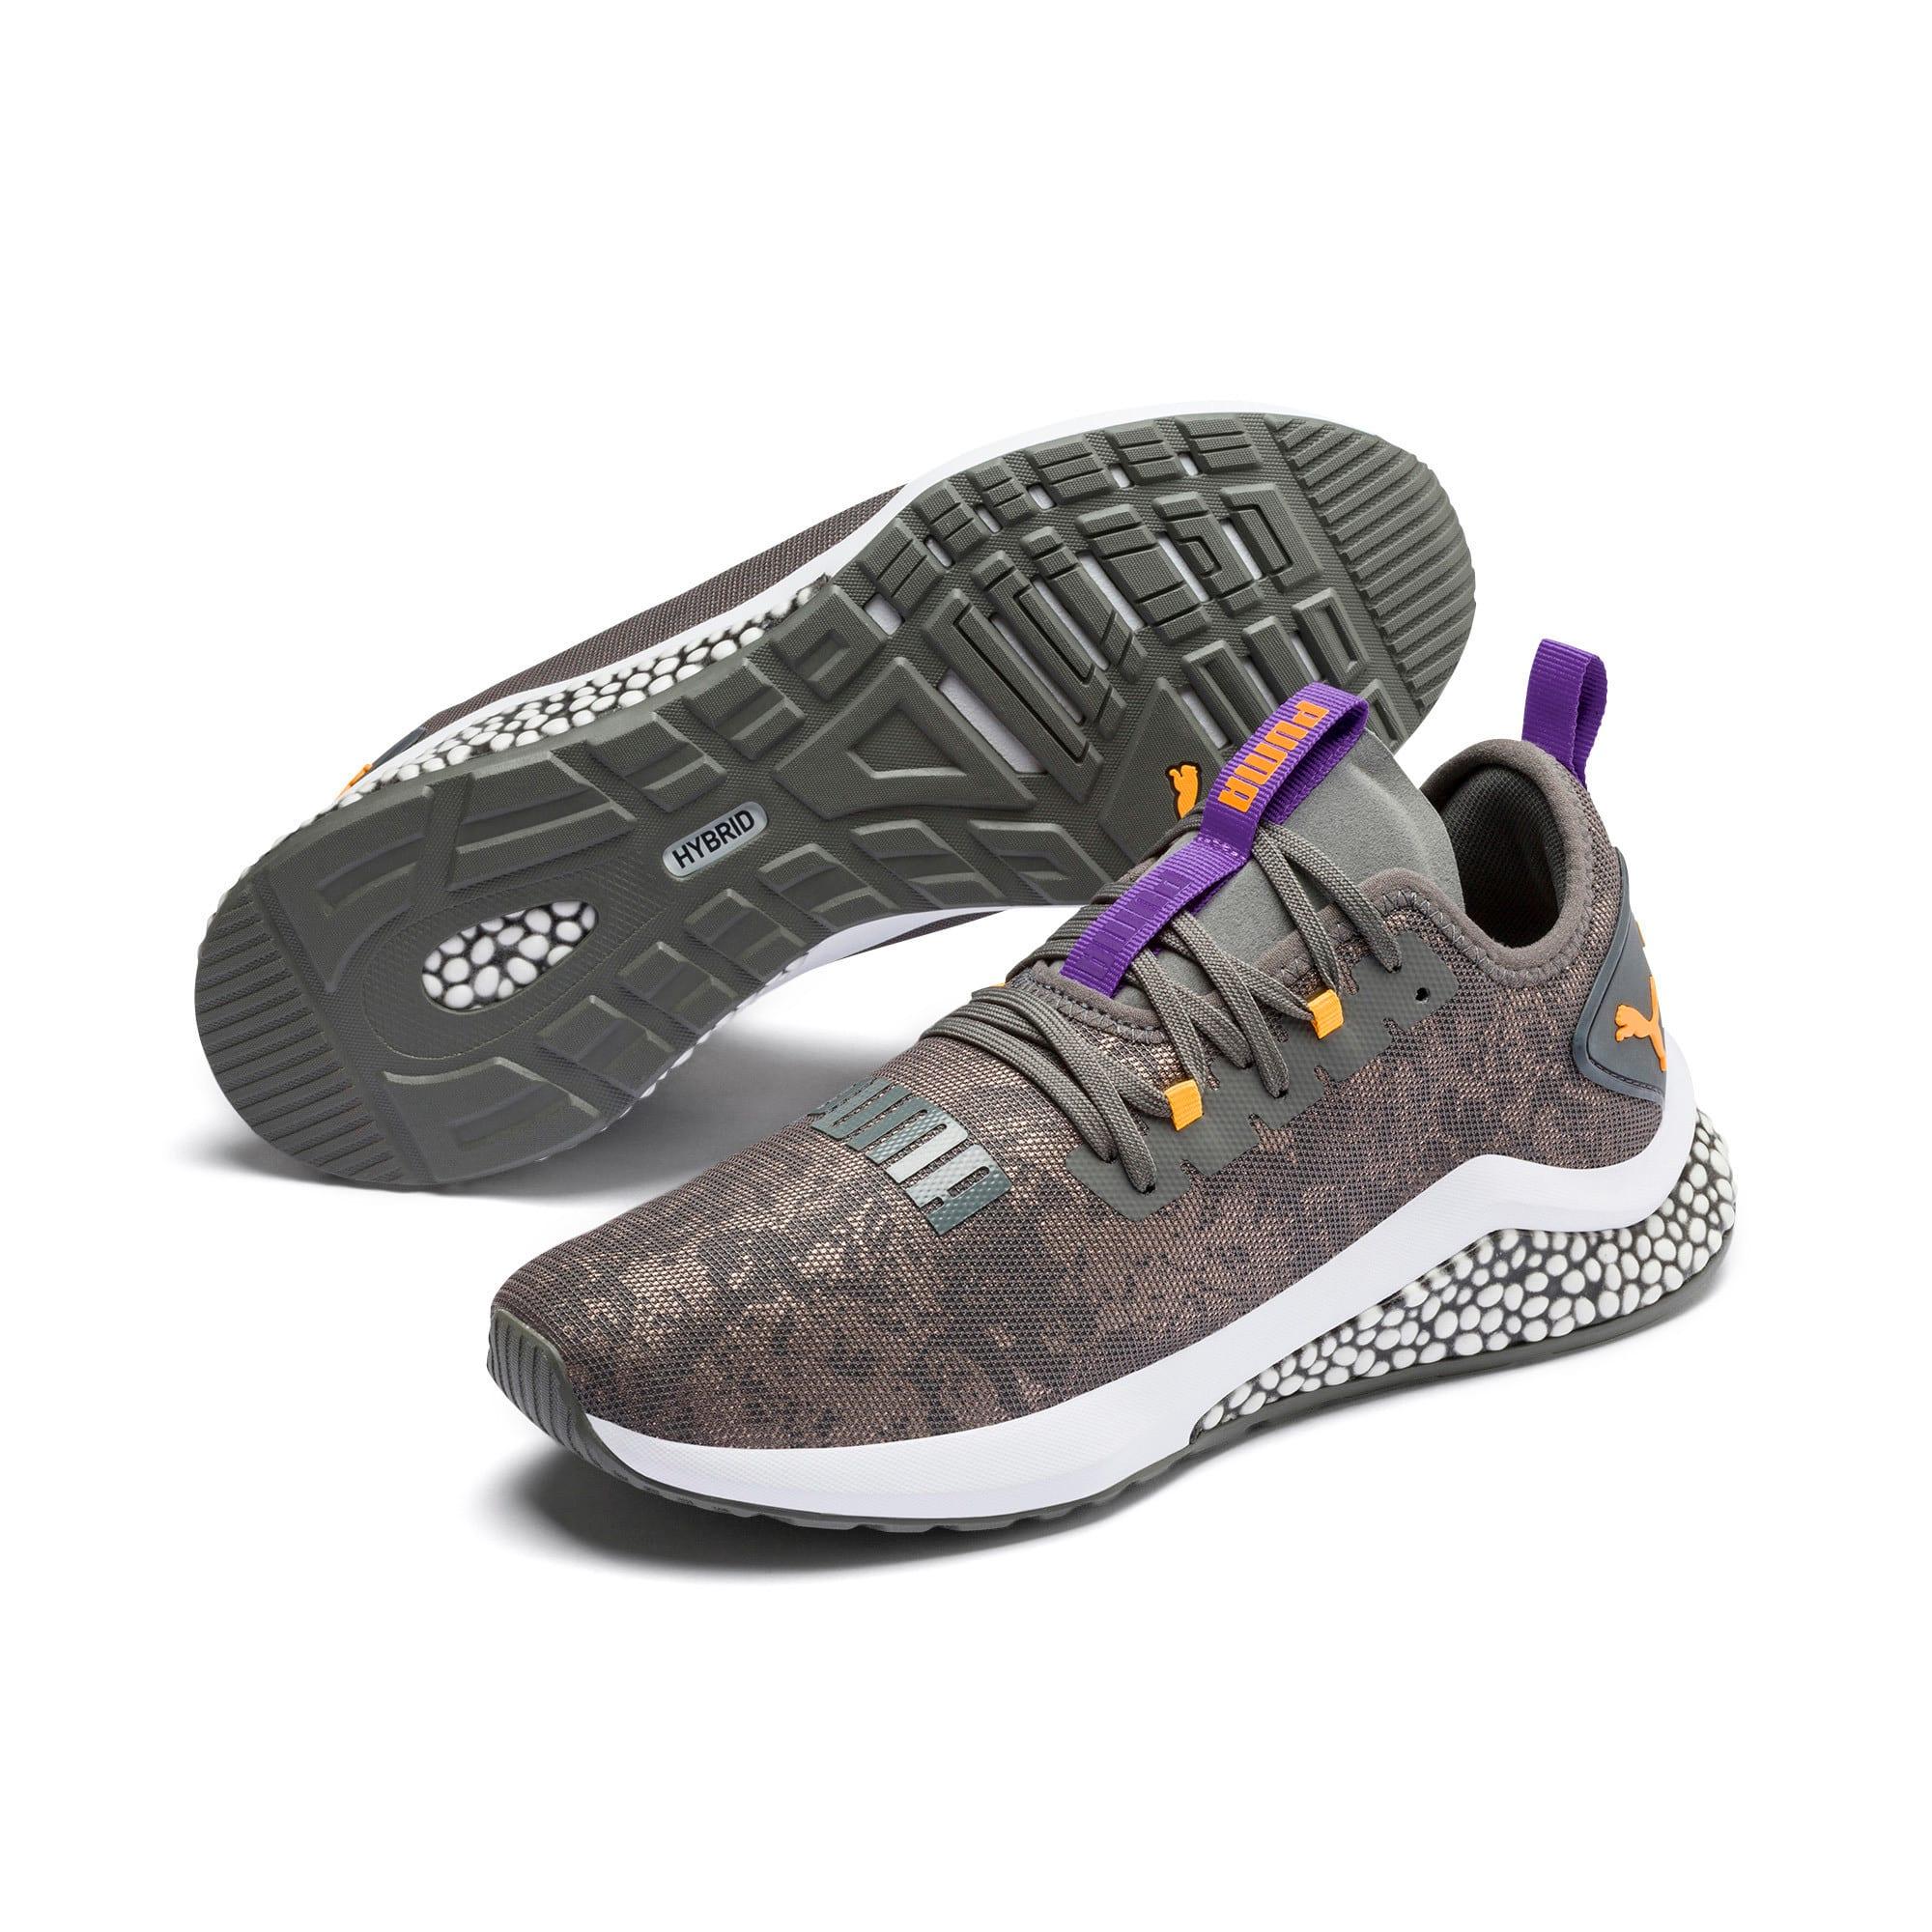 Thumbnail 2 of HYBRID NX Rave Men's Running Shoes, CASTLEROCK-Purple-Orange, medium